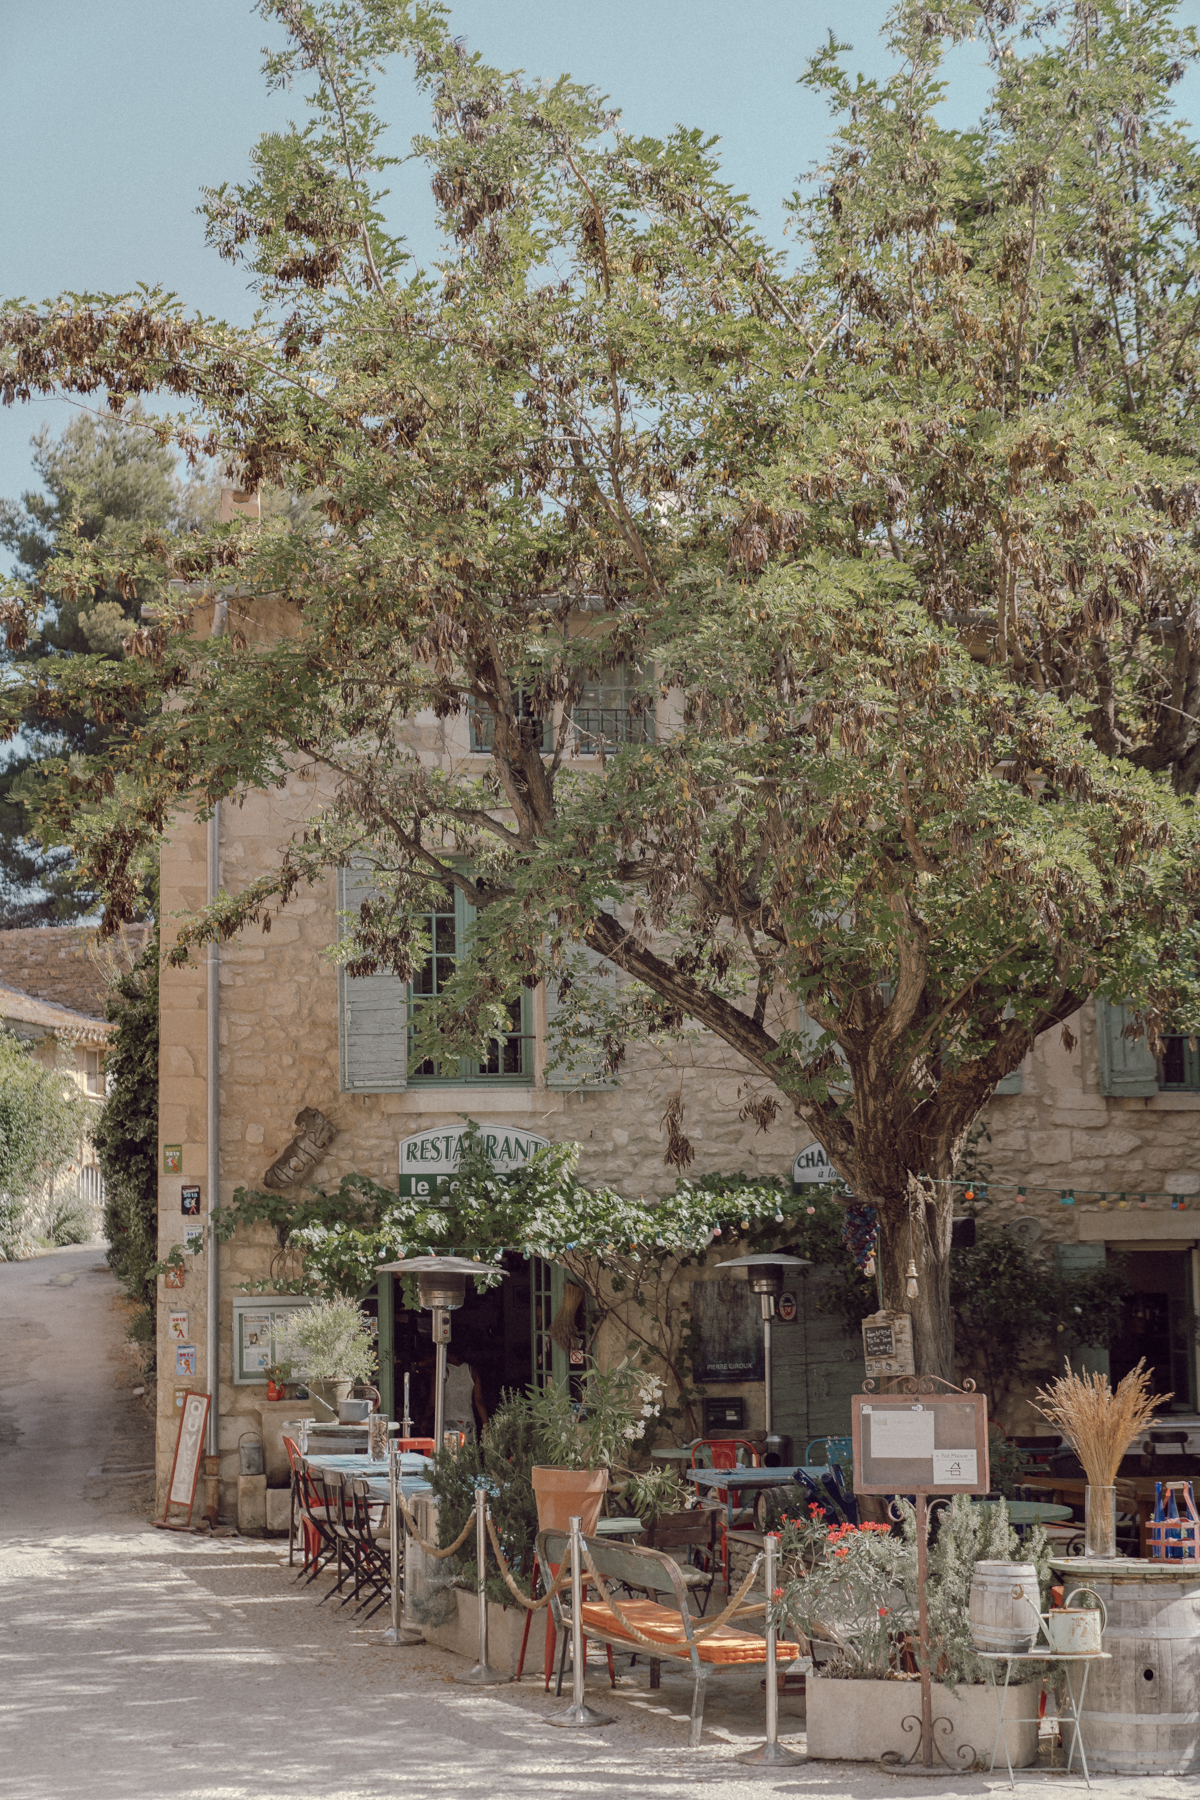 provence-menerbes-oppede-isle-sur-la-sorgue-42